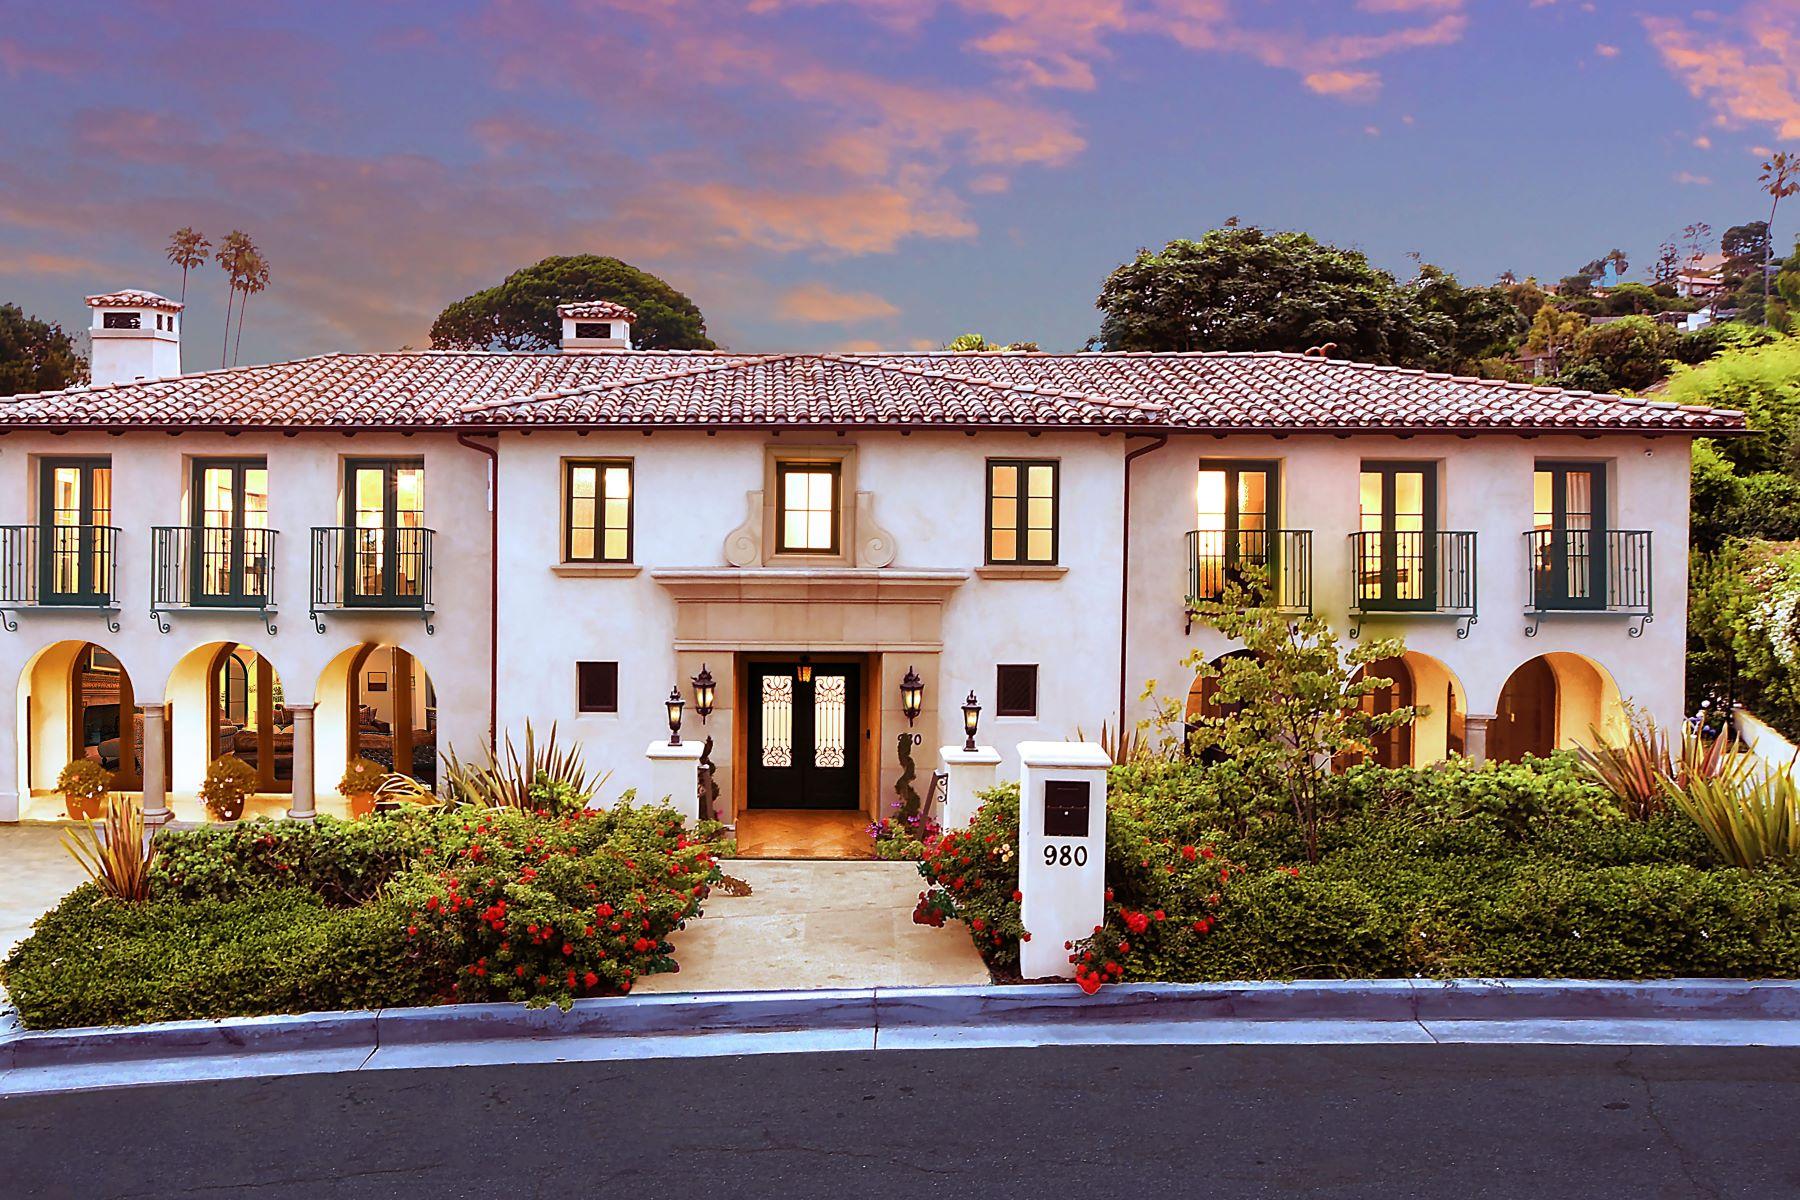 Single Family Homes for Sale at 980 Via Rincon, Palos Verdes Estates, CA 90274 980 Via Rincon Palos Verdes Estates, California 90274 United States